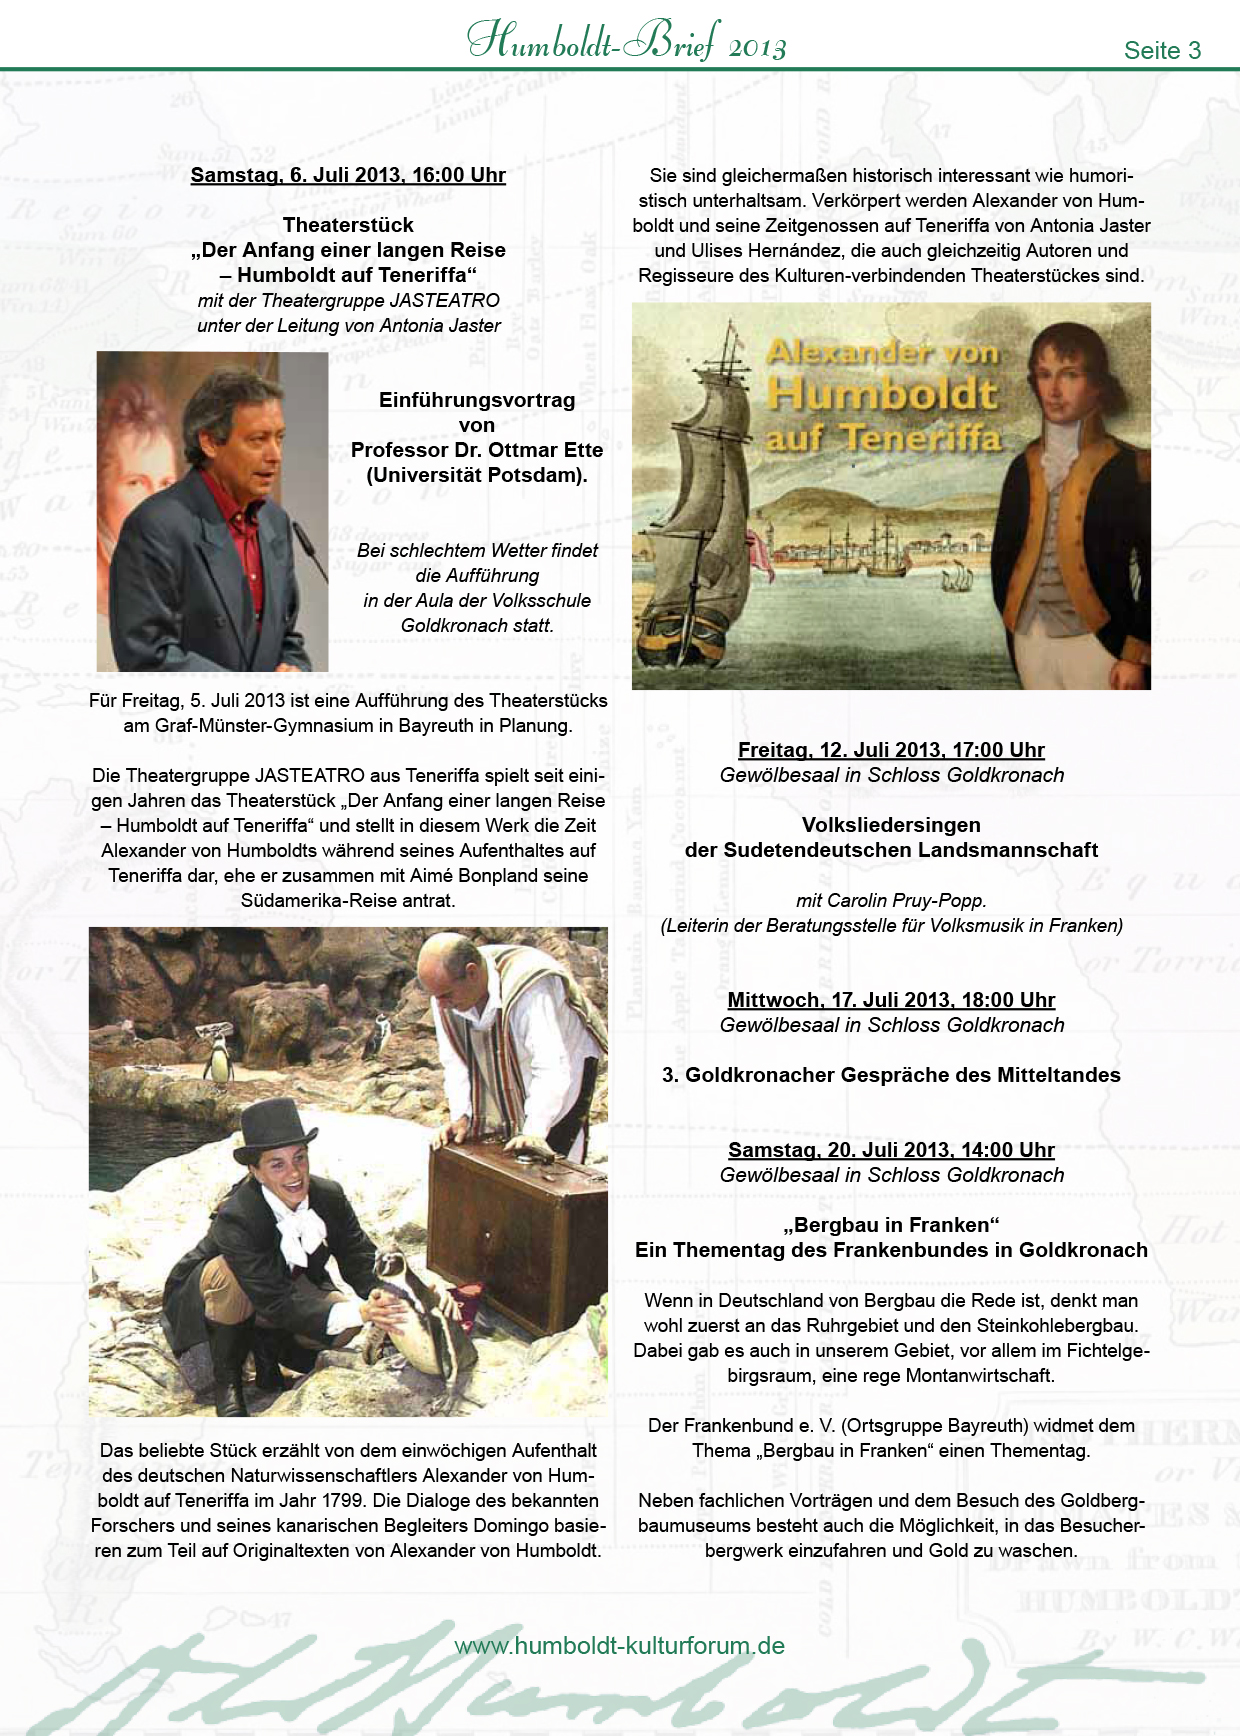 Humboldt-Brief 2013 Internet-3